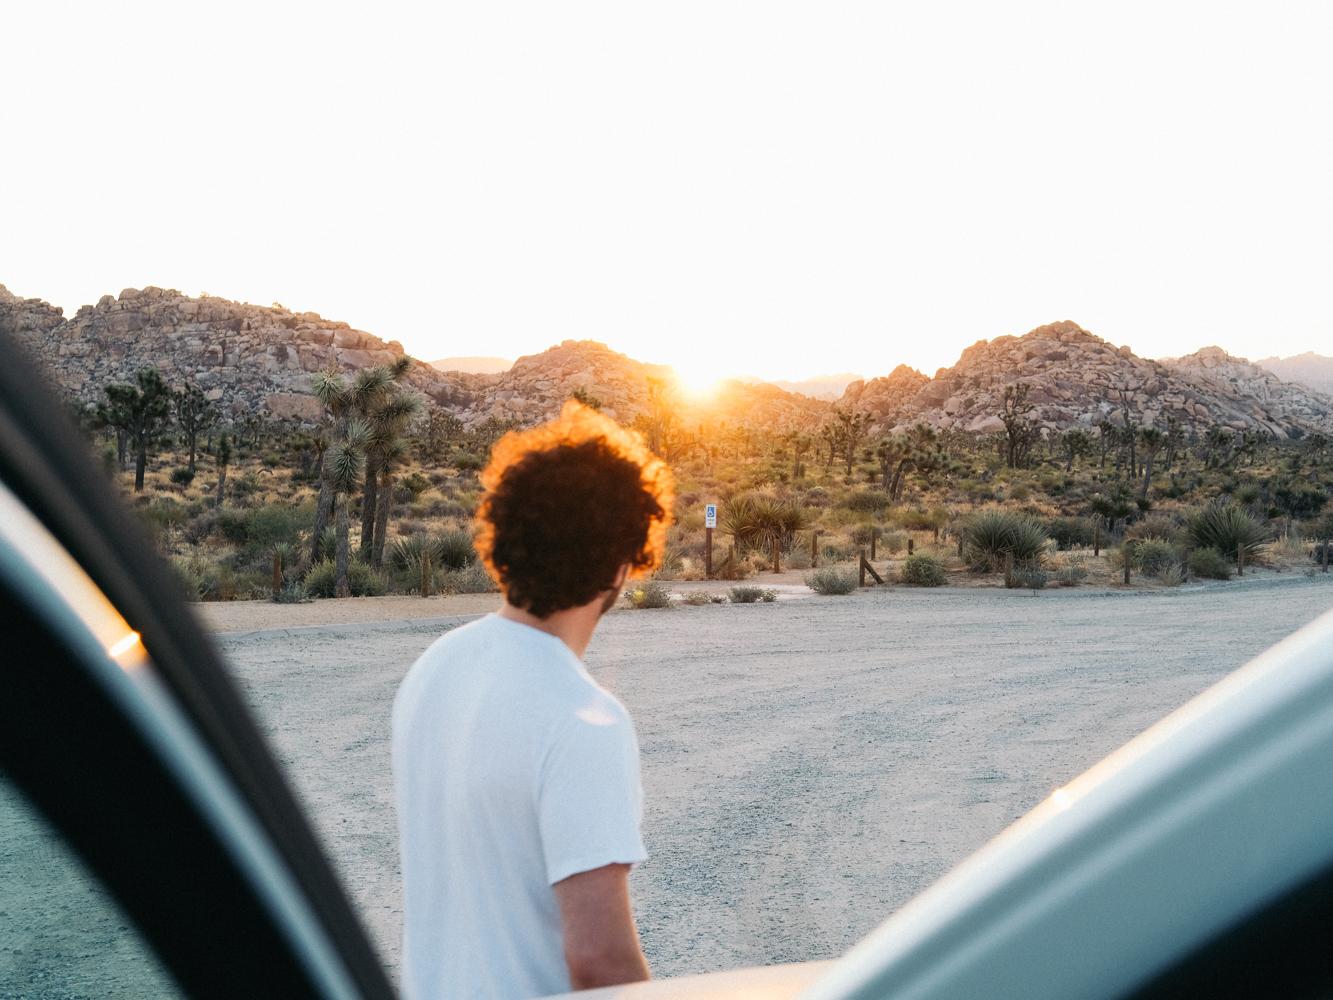 Joshua_Tree-Cookwilltravel-Road_Trip.jpg